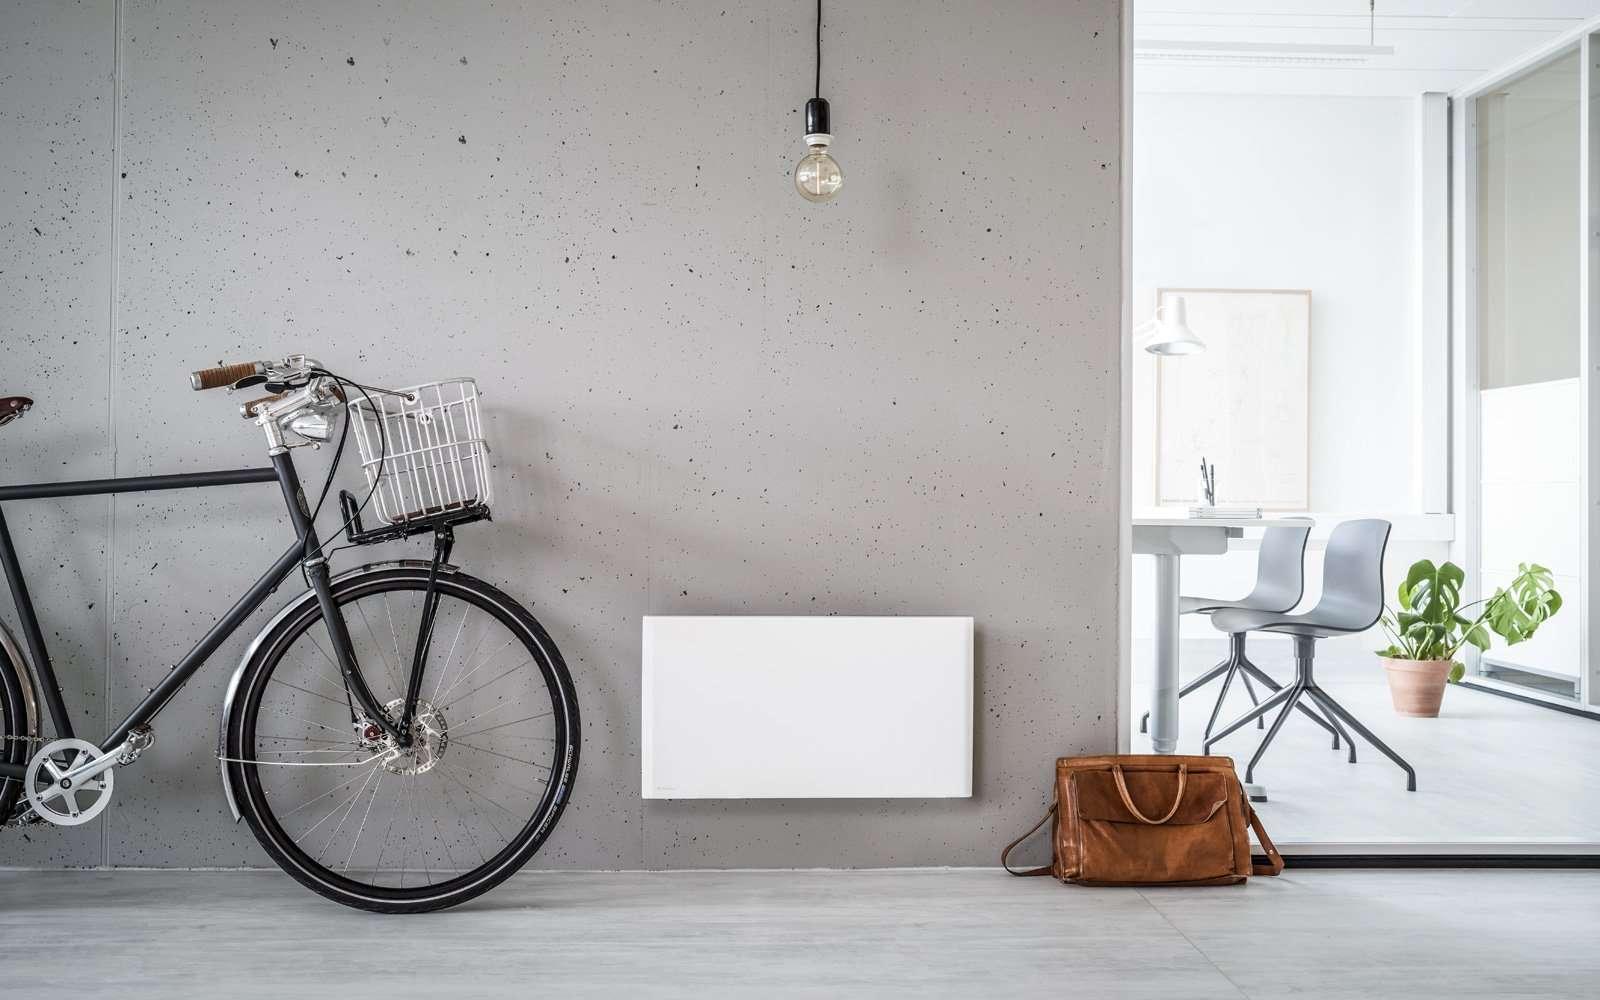 Home riscaldamento elettrico norvegese dimplex for Dimplex radiatori elettrici